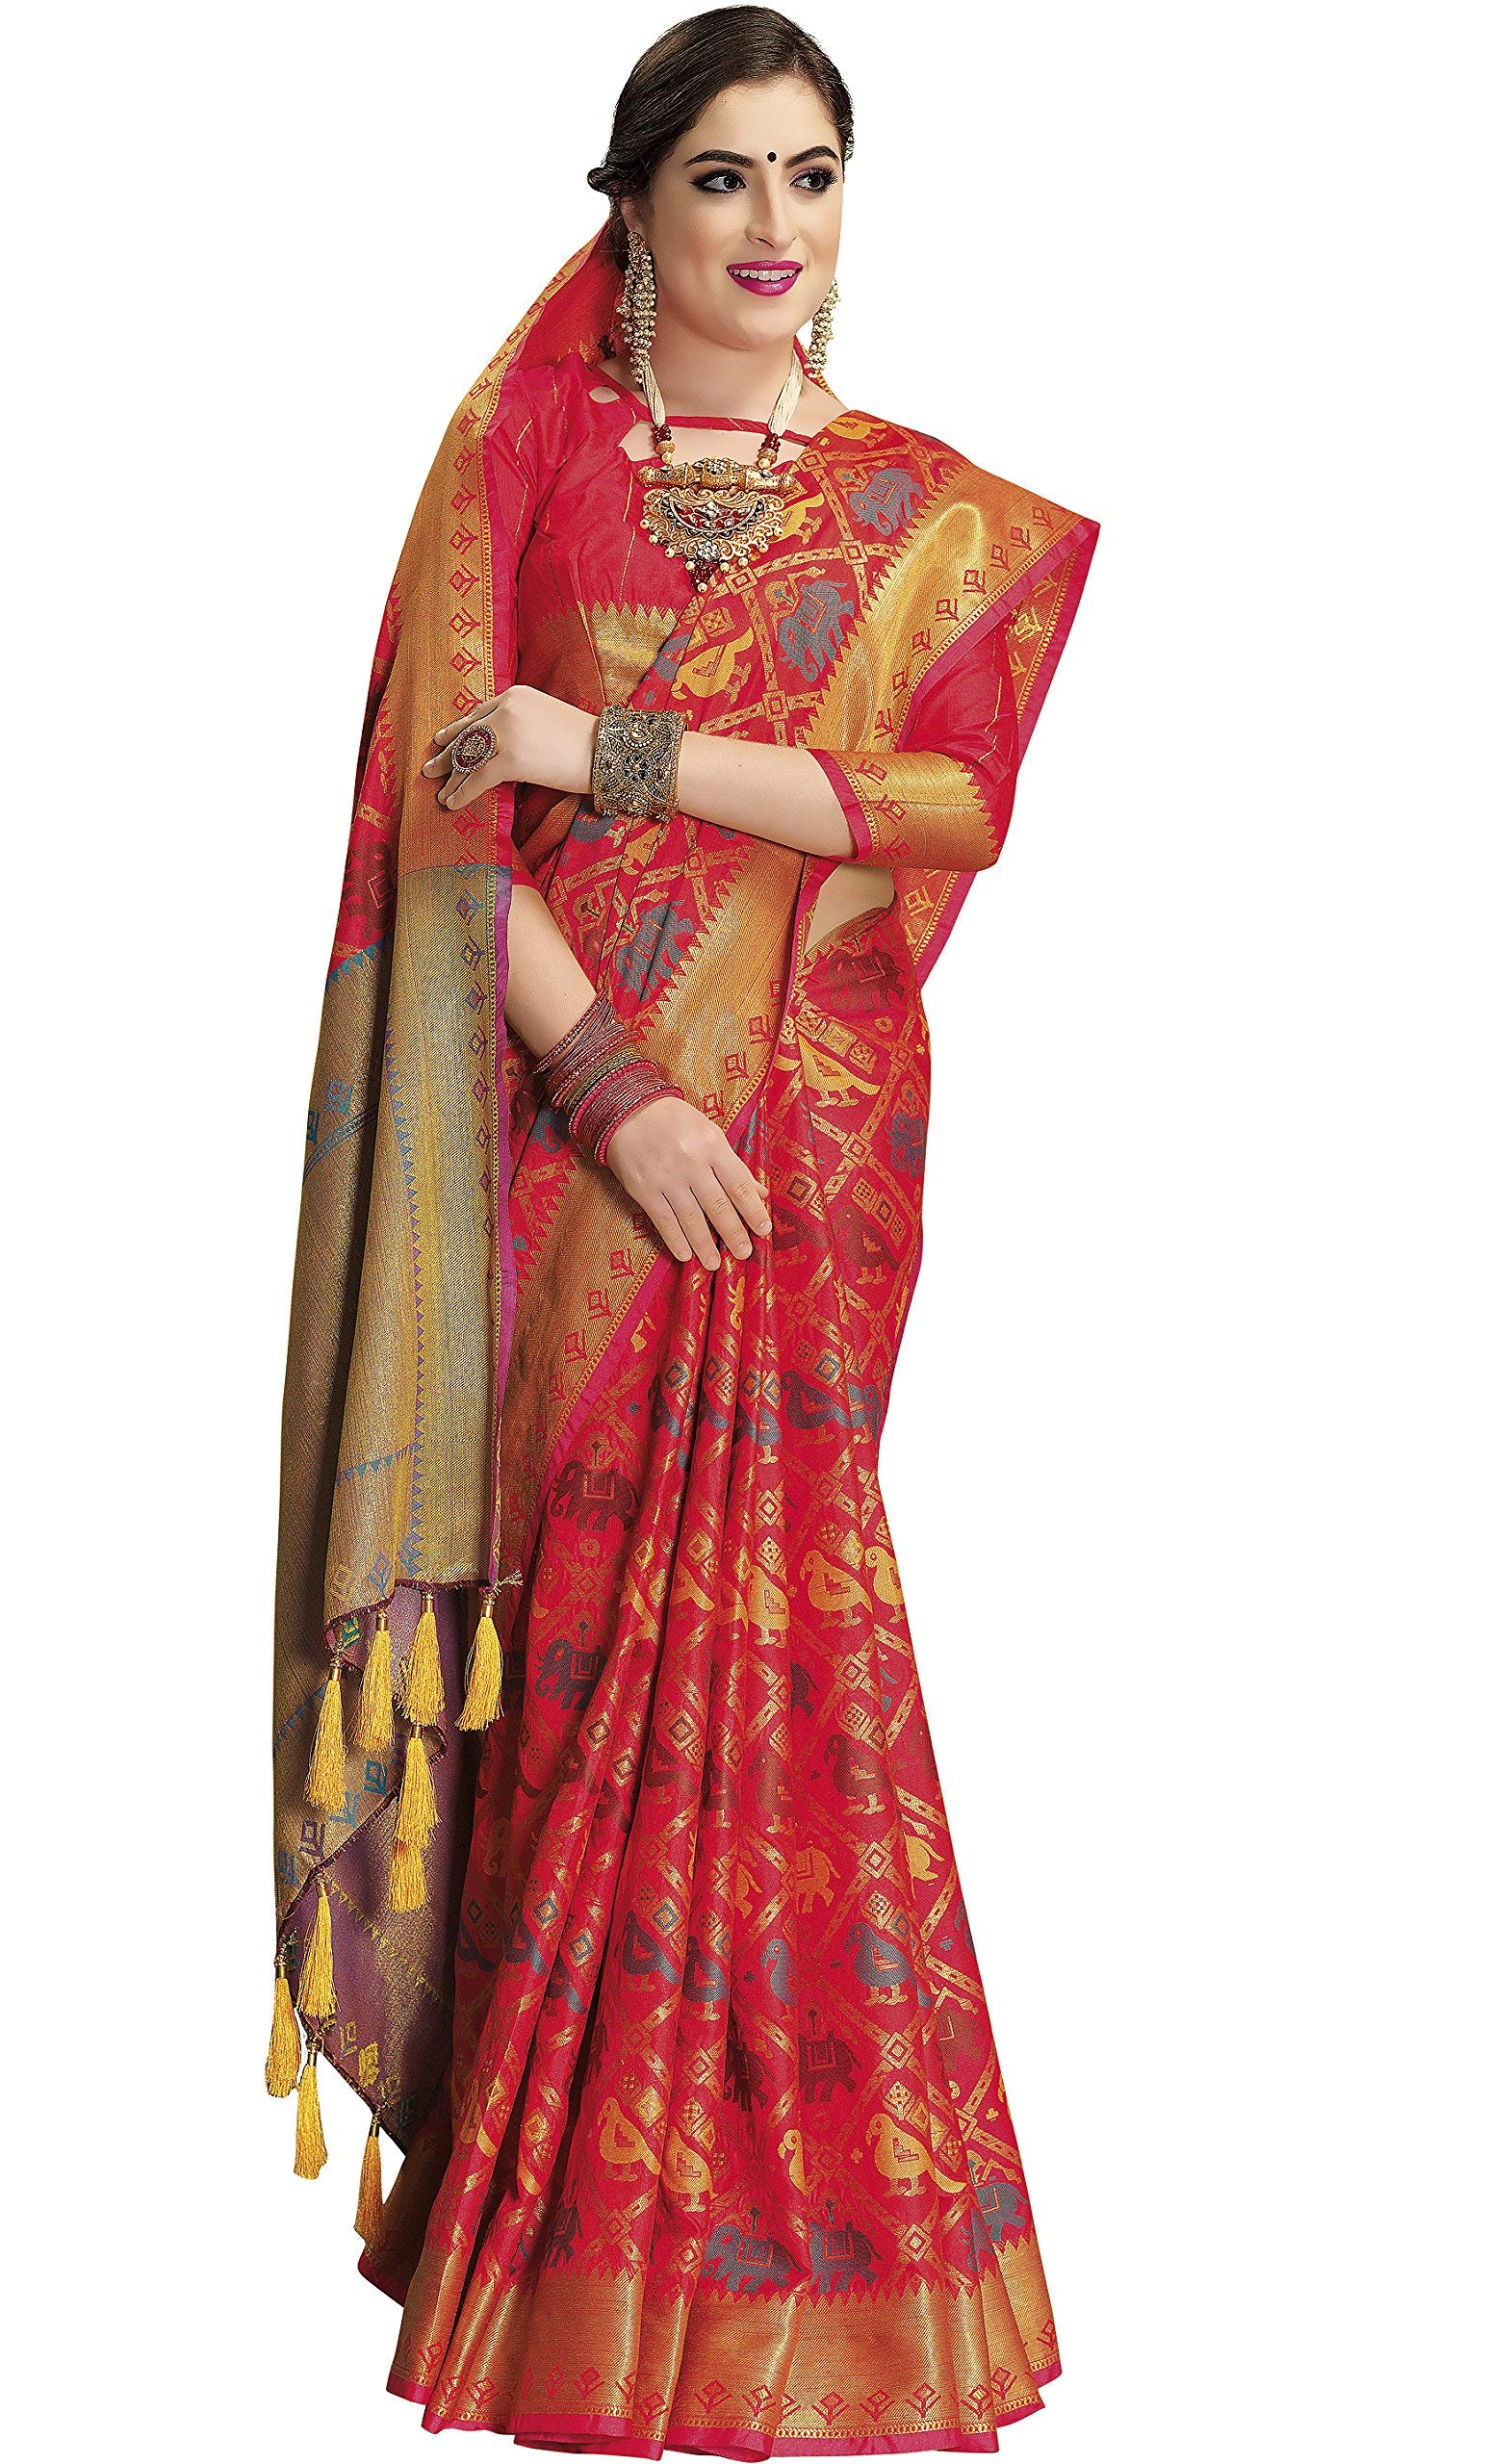 635b22dbcf EthnicJunction Double Ikat Woven Banarasi Silk Saree With Unstitched ...